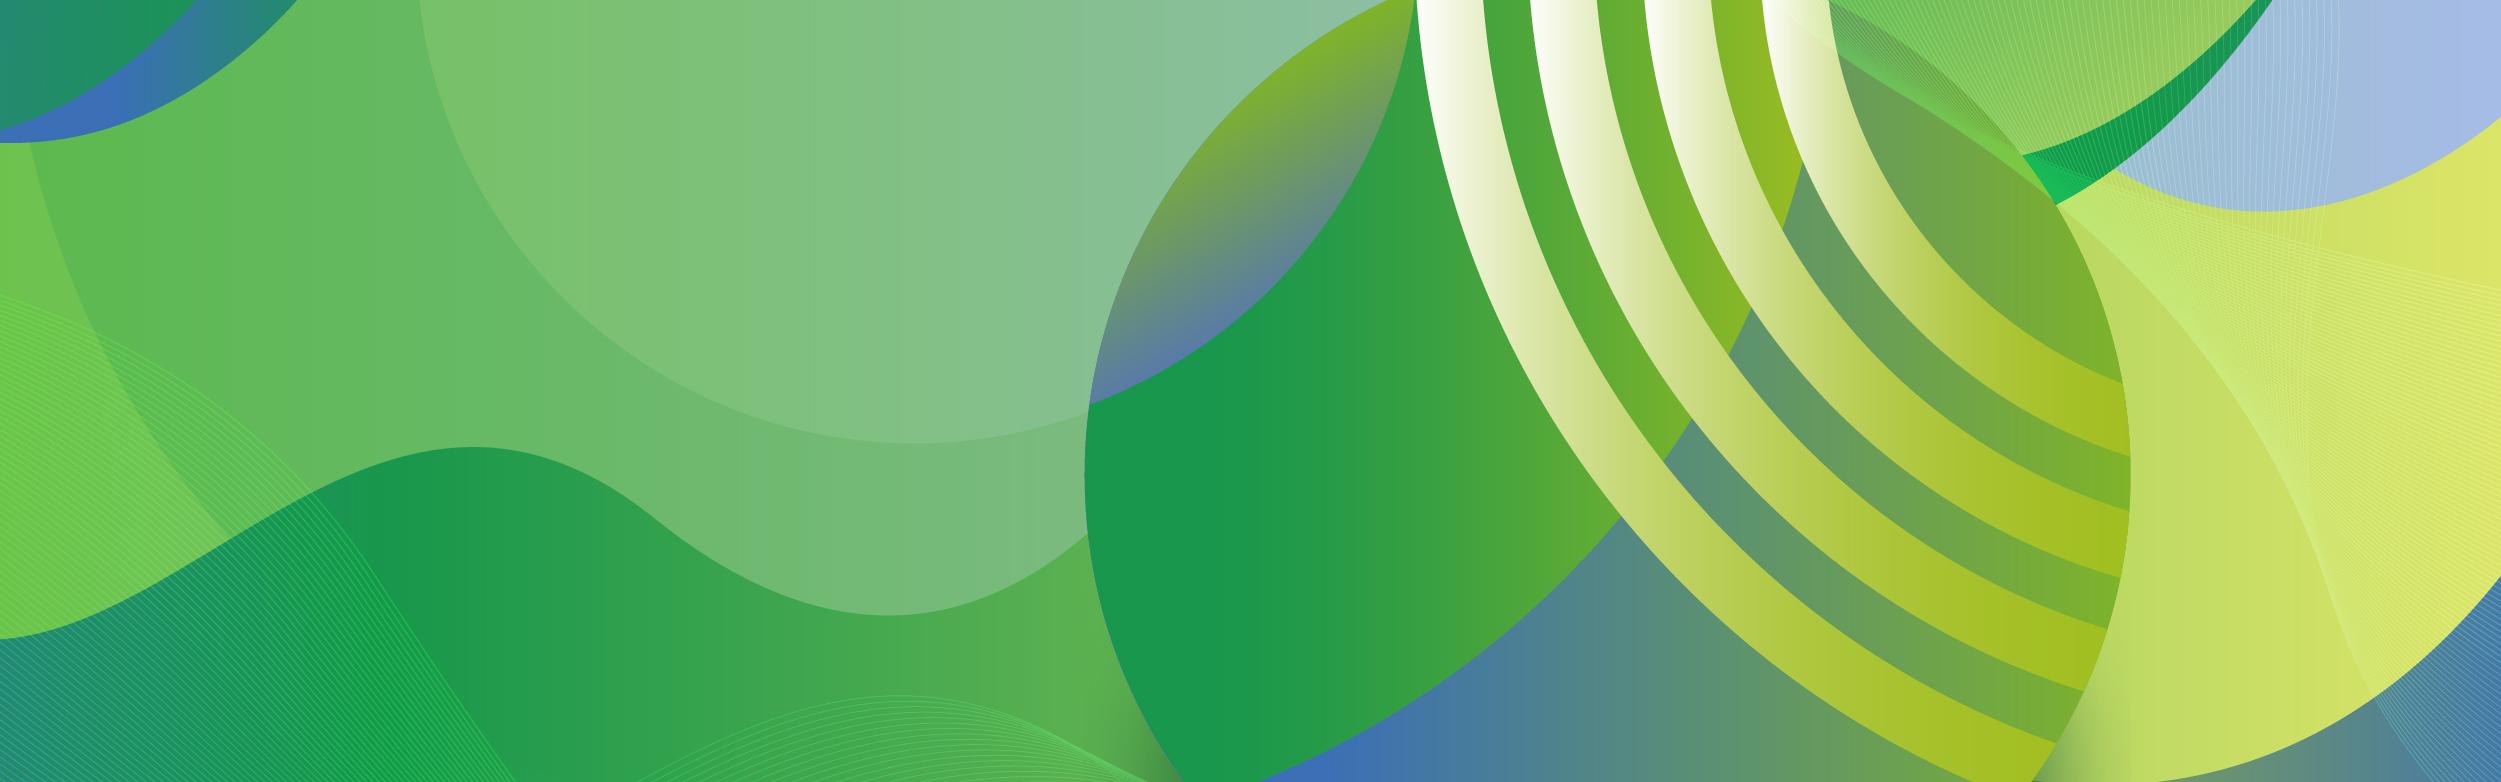 ARISE Fellowships for technology developers - EMBL - Header